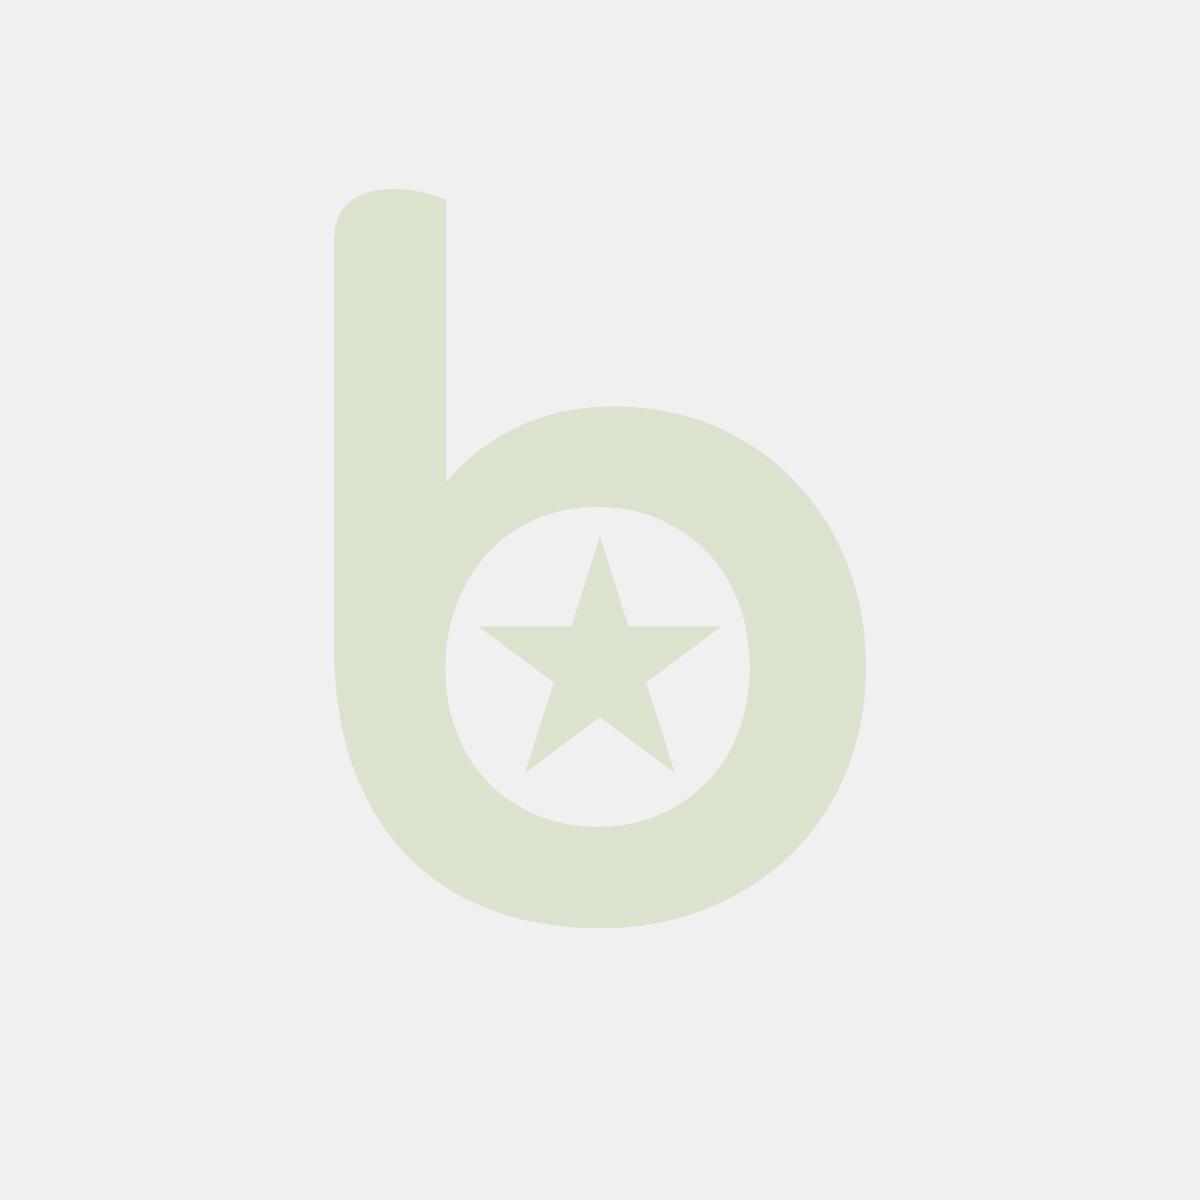 Bemar Kitchen Line Z Kranem Spustowym - Gn 1/1